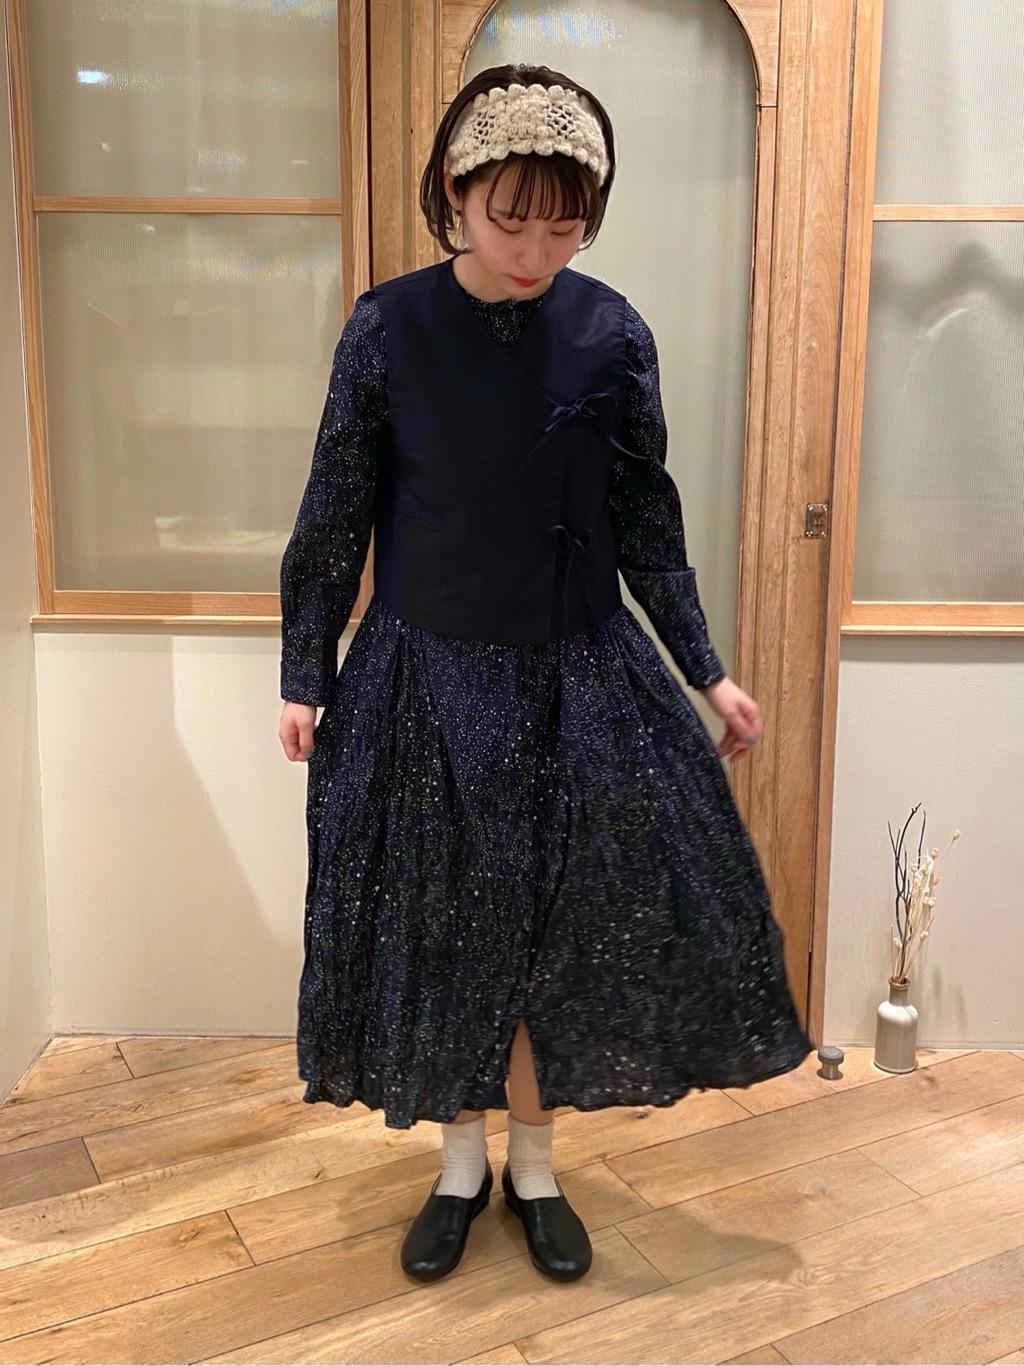 bulle de savon 新宿ミロード 身長:157cm 2021.01.12